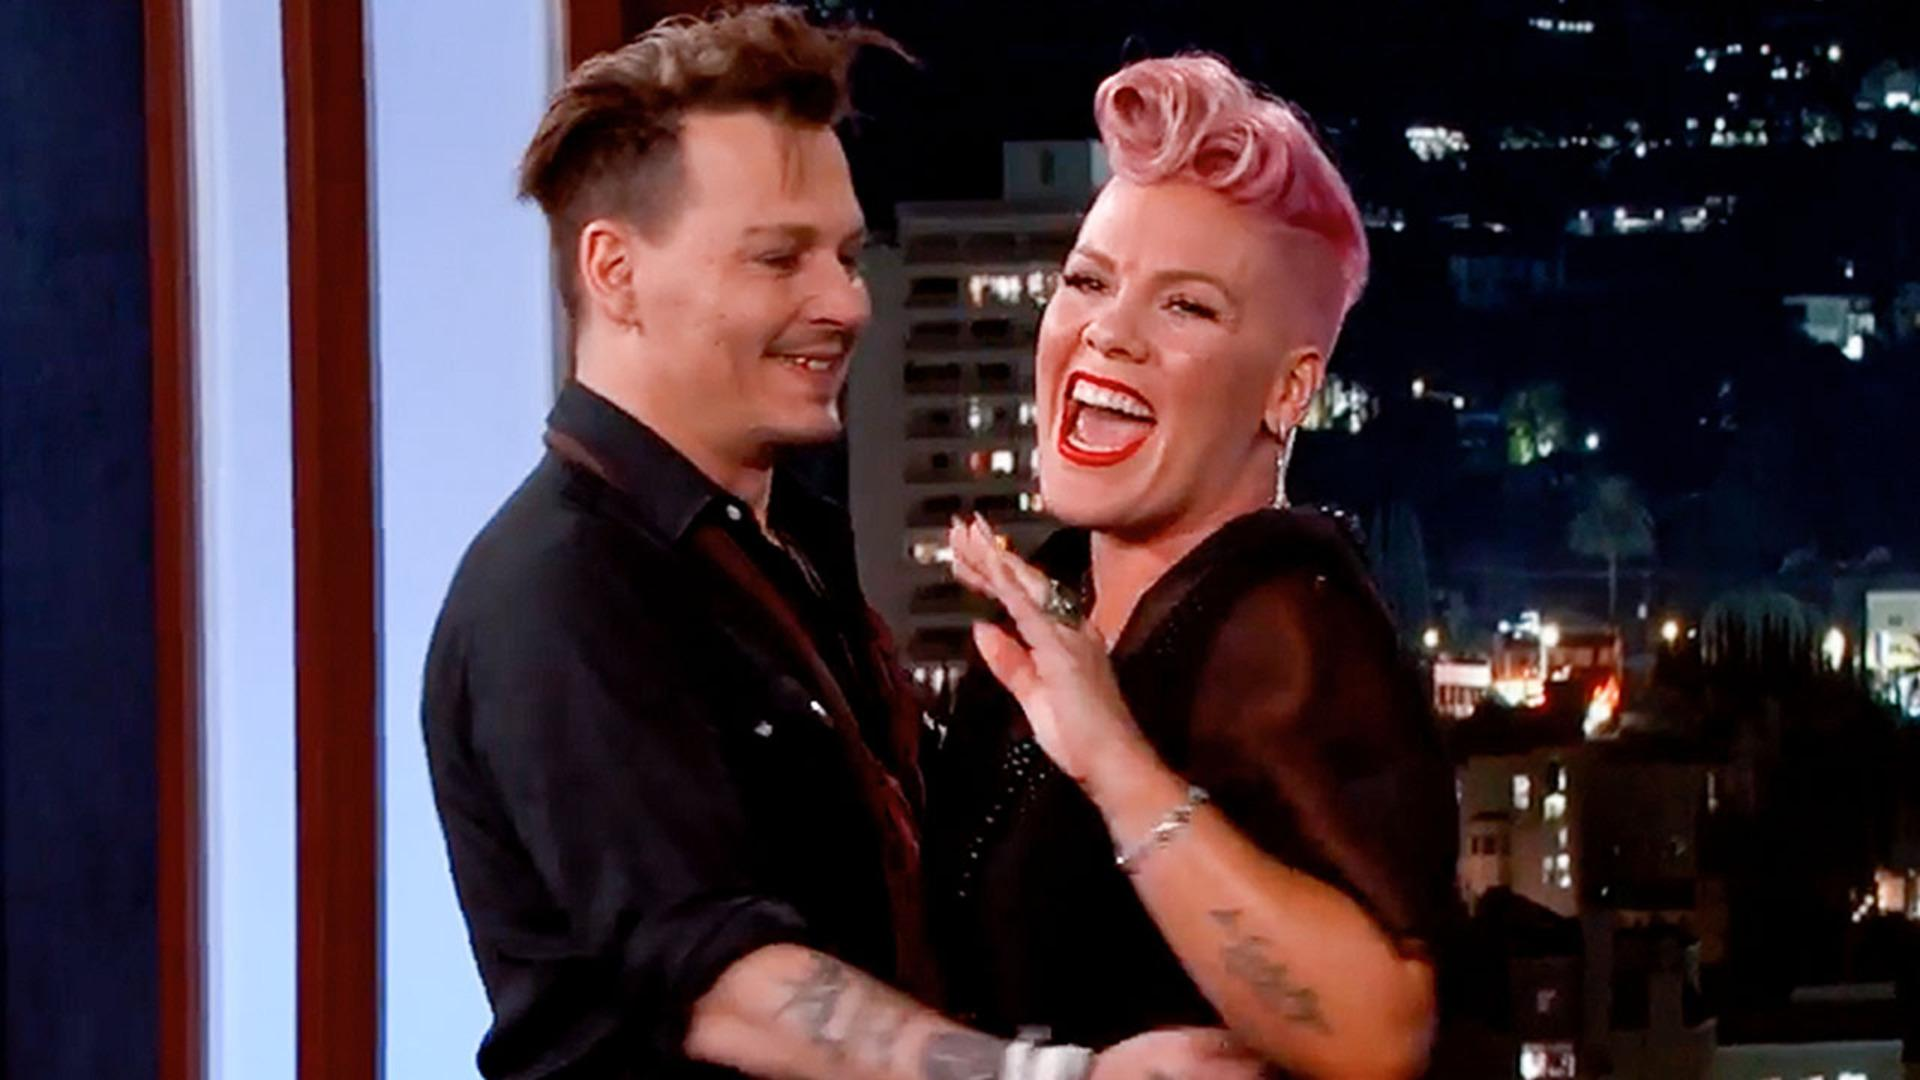 Johnny Depp Surprises Pink on Jimmy Kimmel; Makes Her Blush